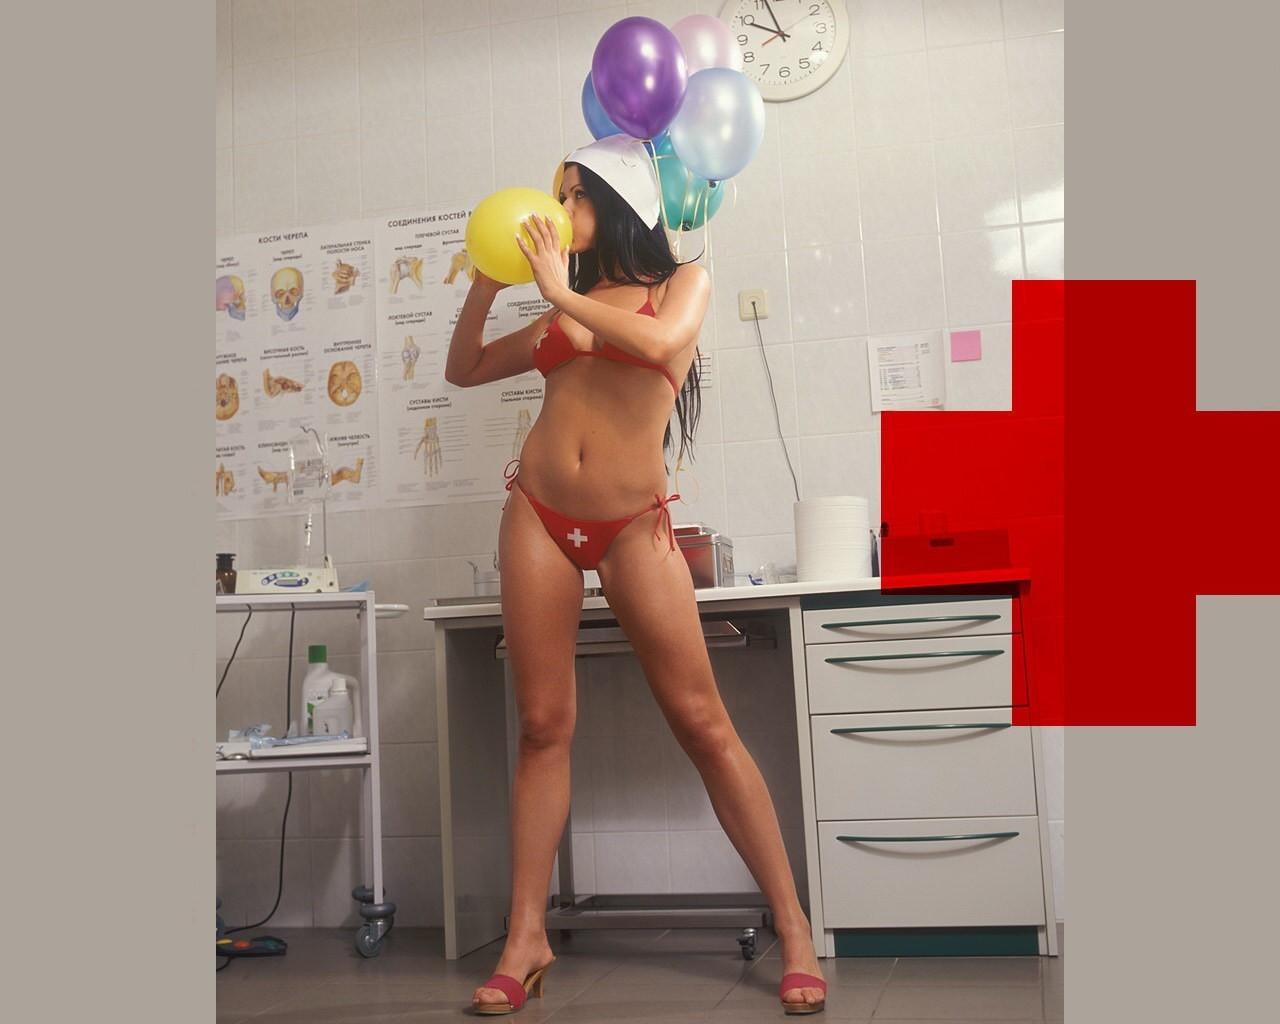 Фото с медсестрами 4 фотография